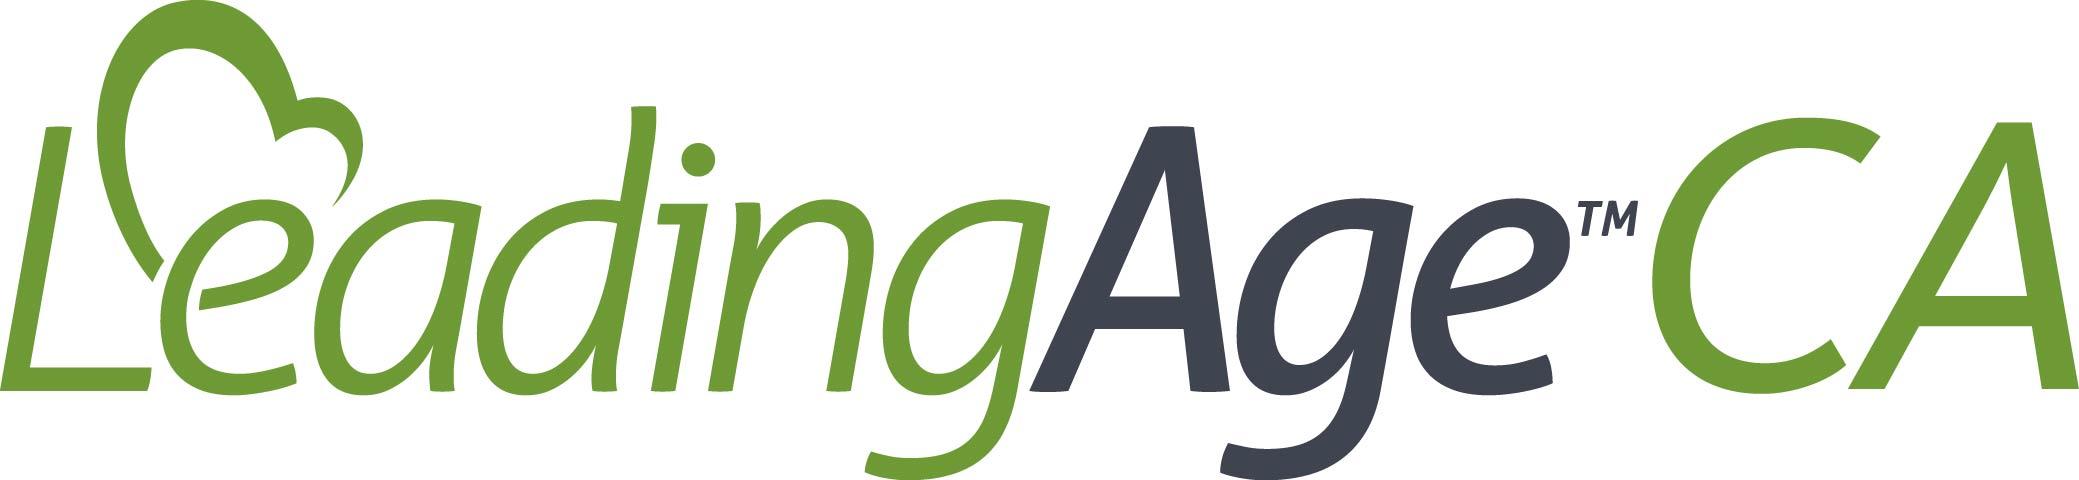 Leadingage California Action Center